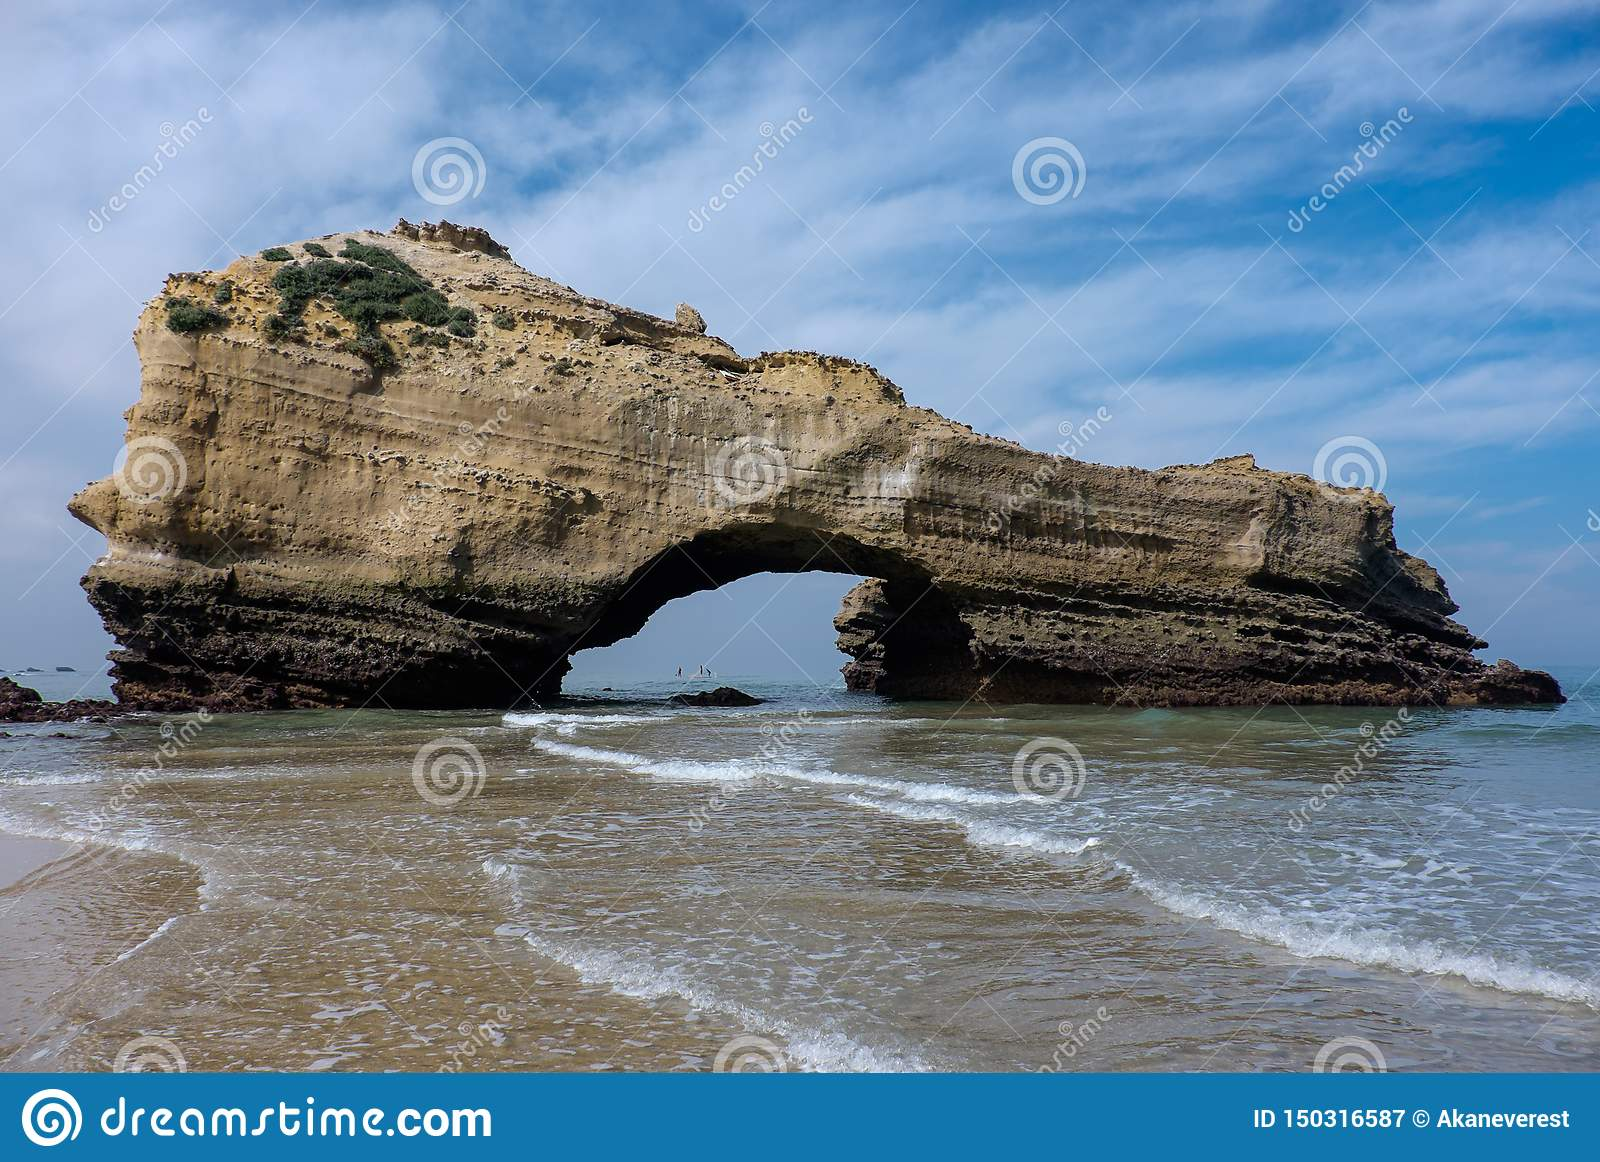 Rocha arqueada na maré baixa na praia de Biarritz, França